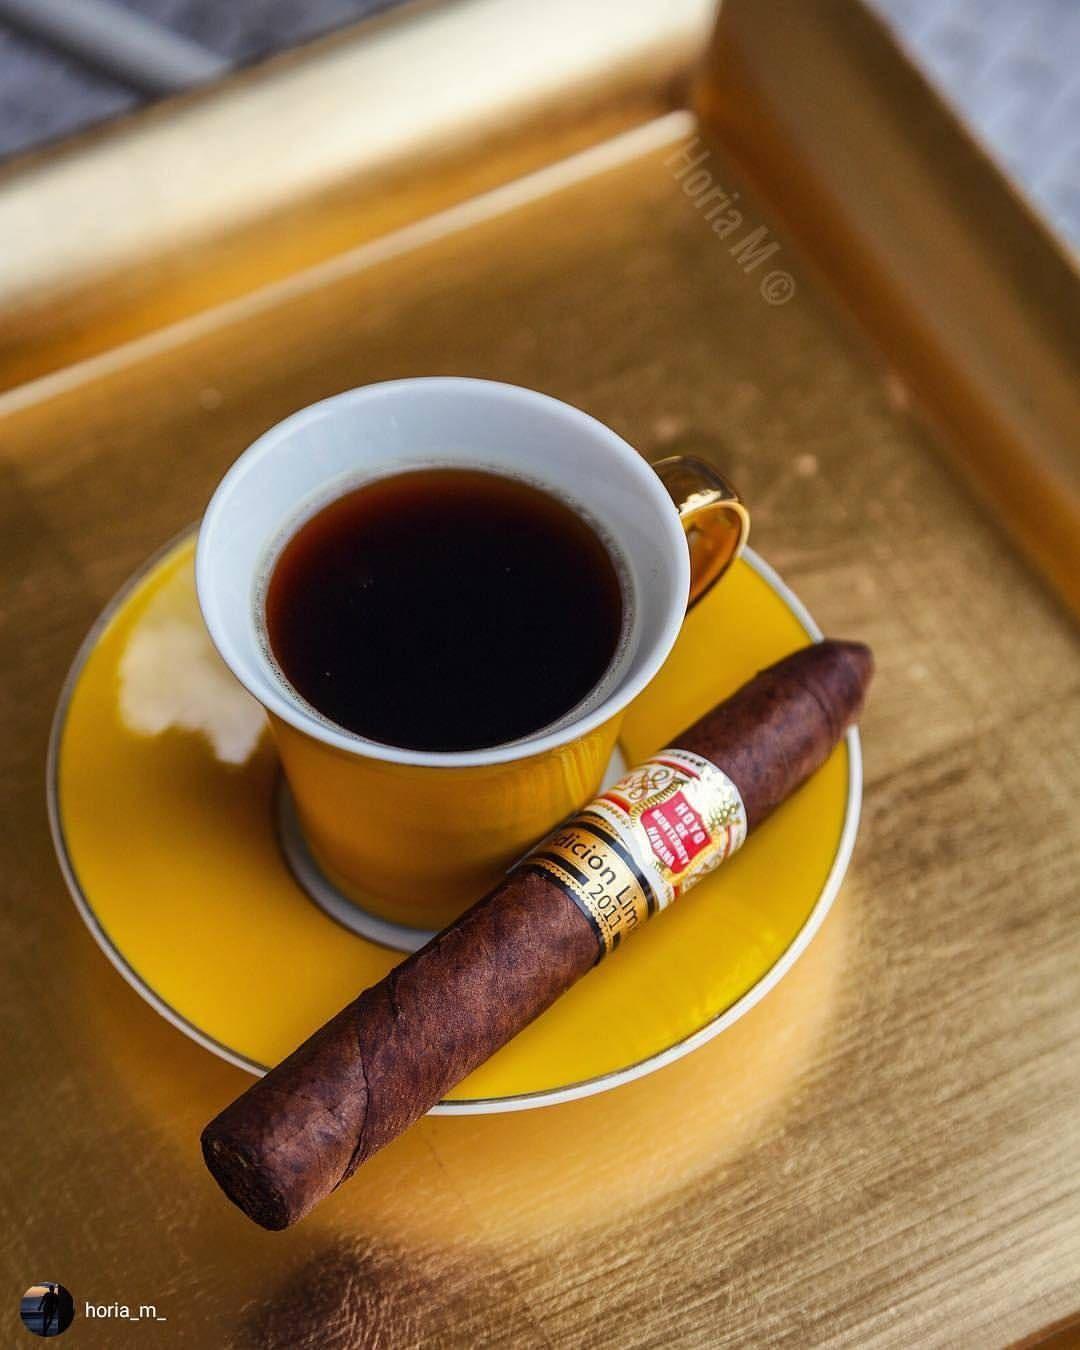 cuban cigars gay video